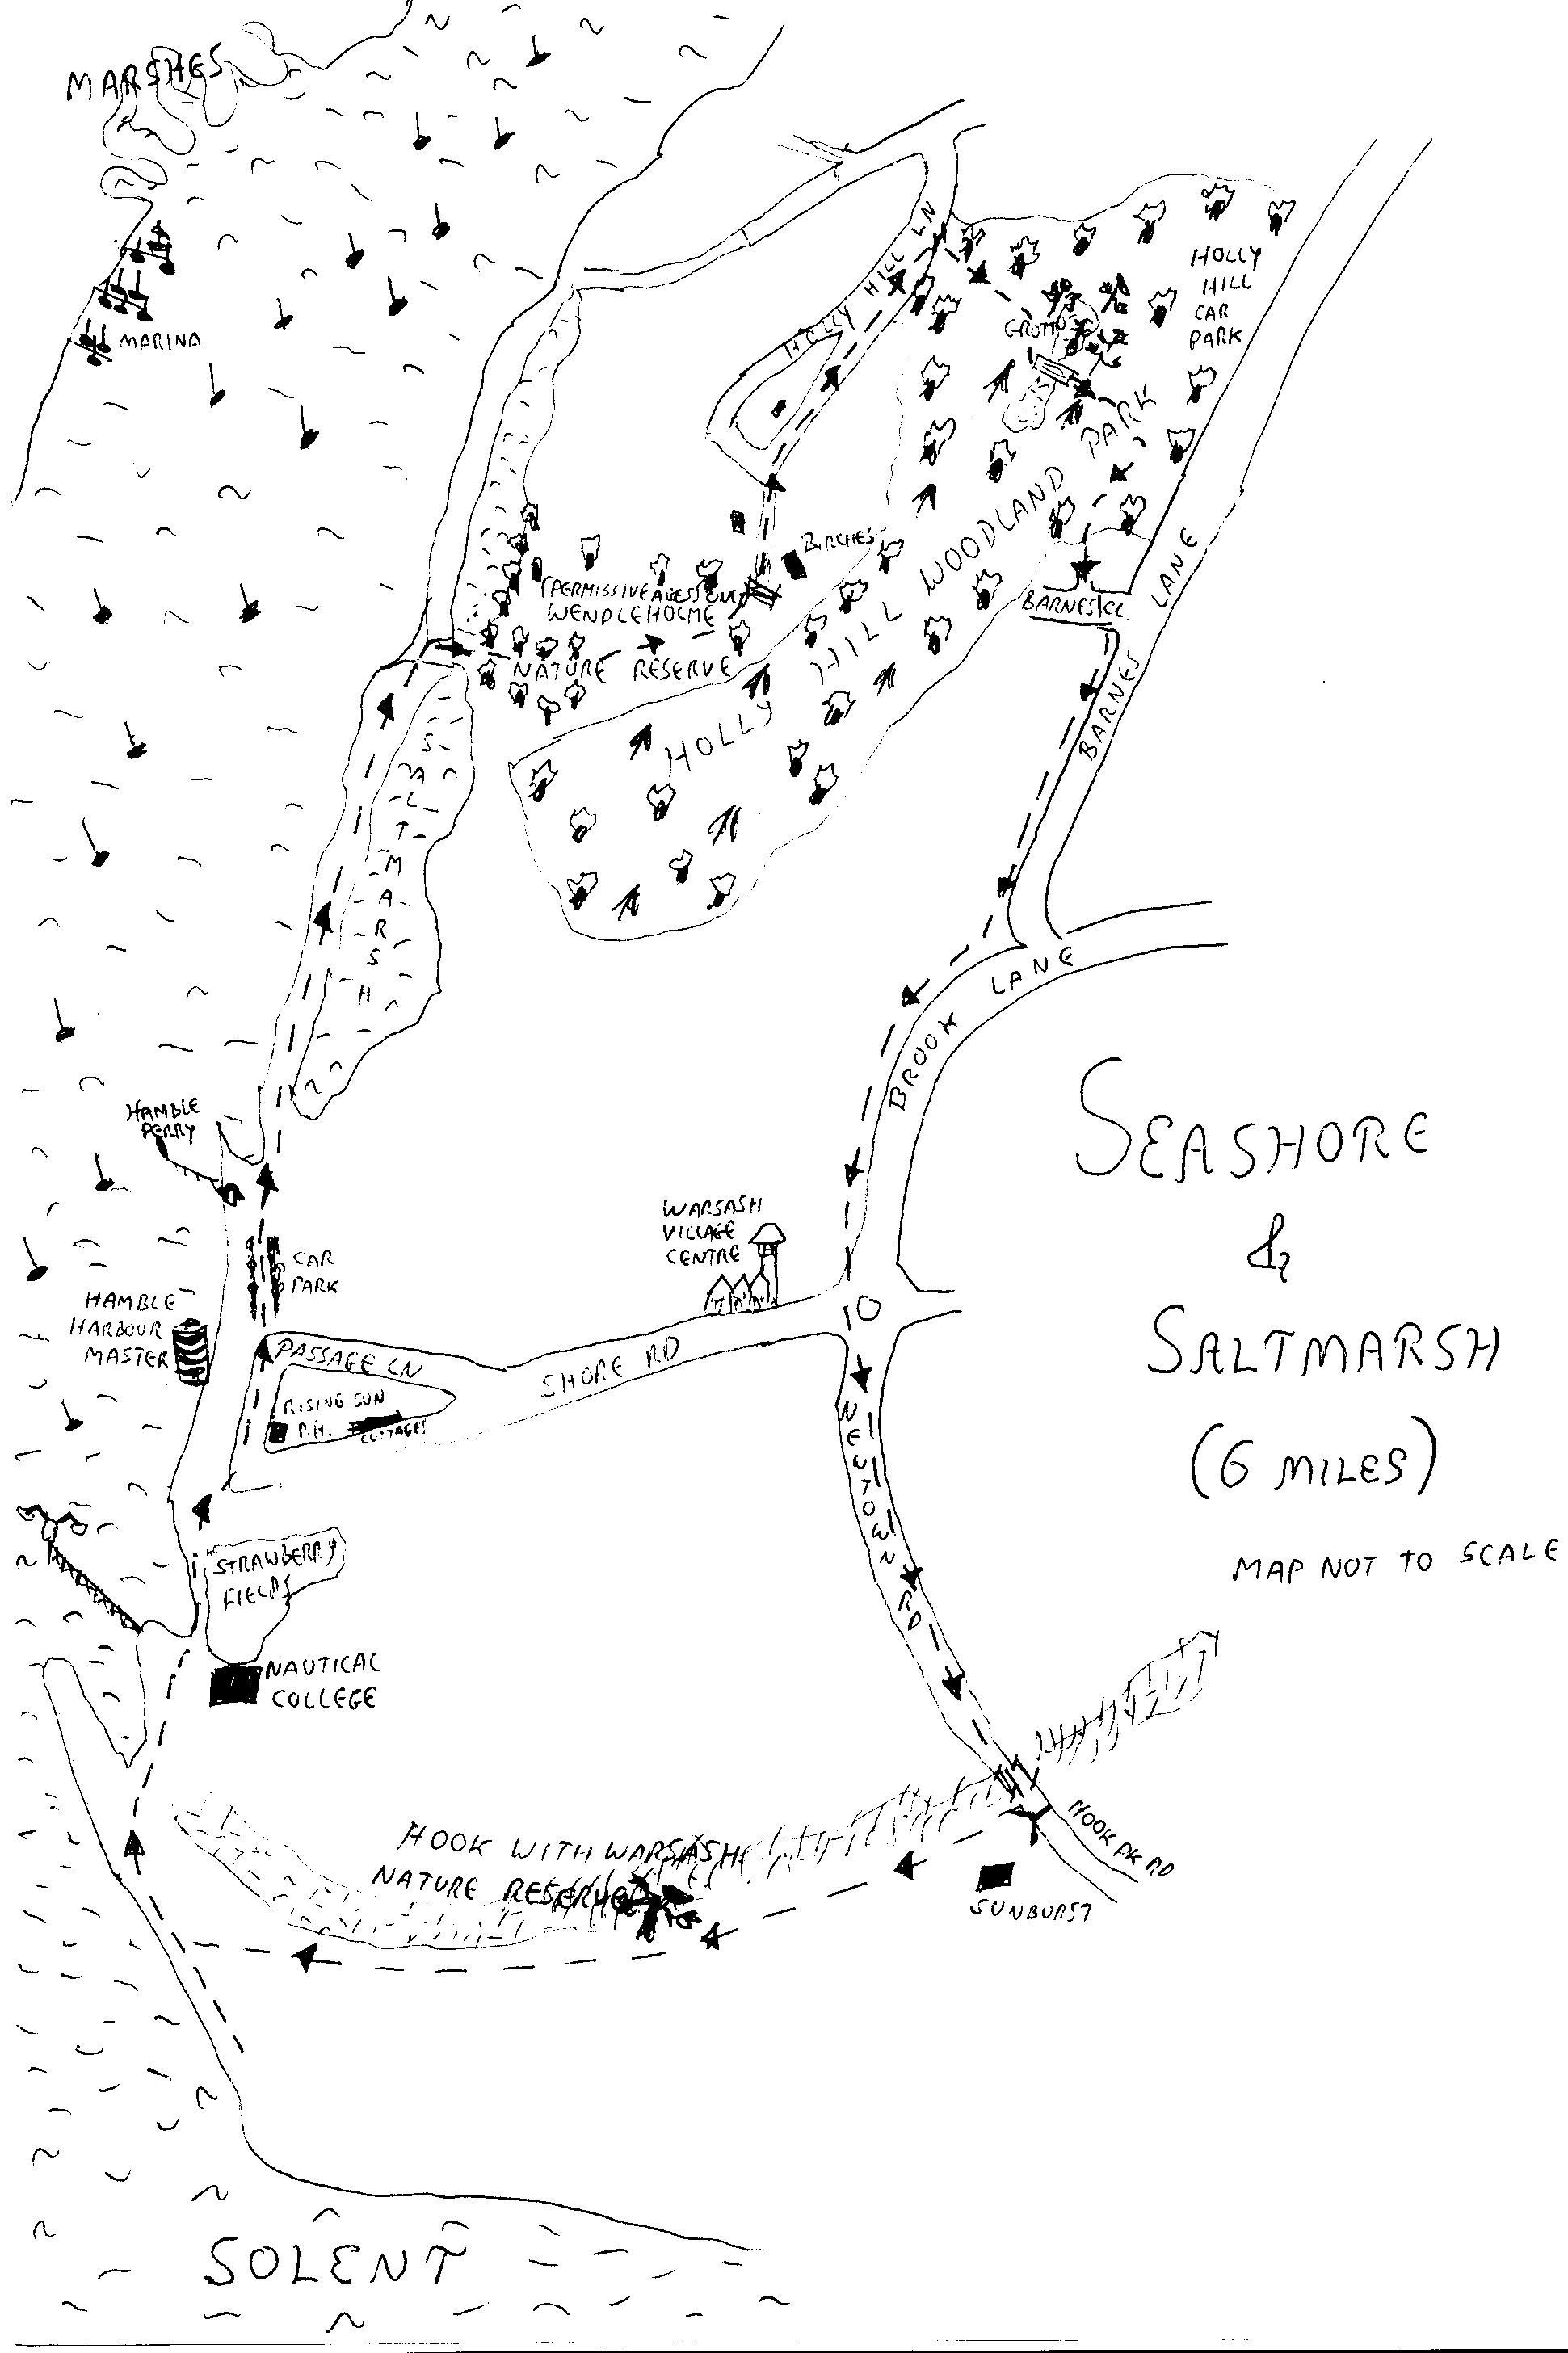 seashore saltmarsh.